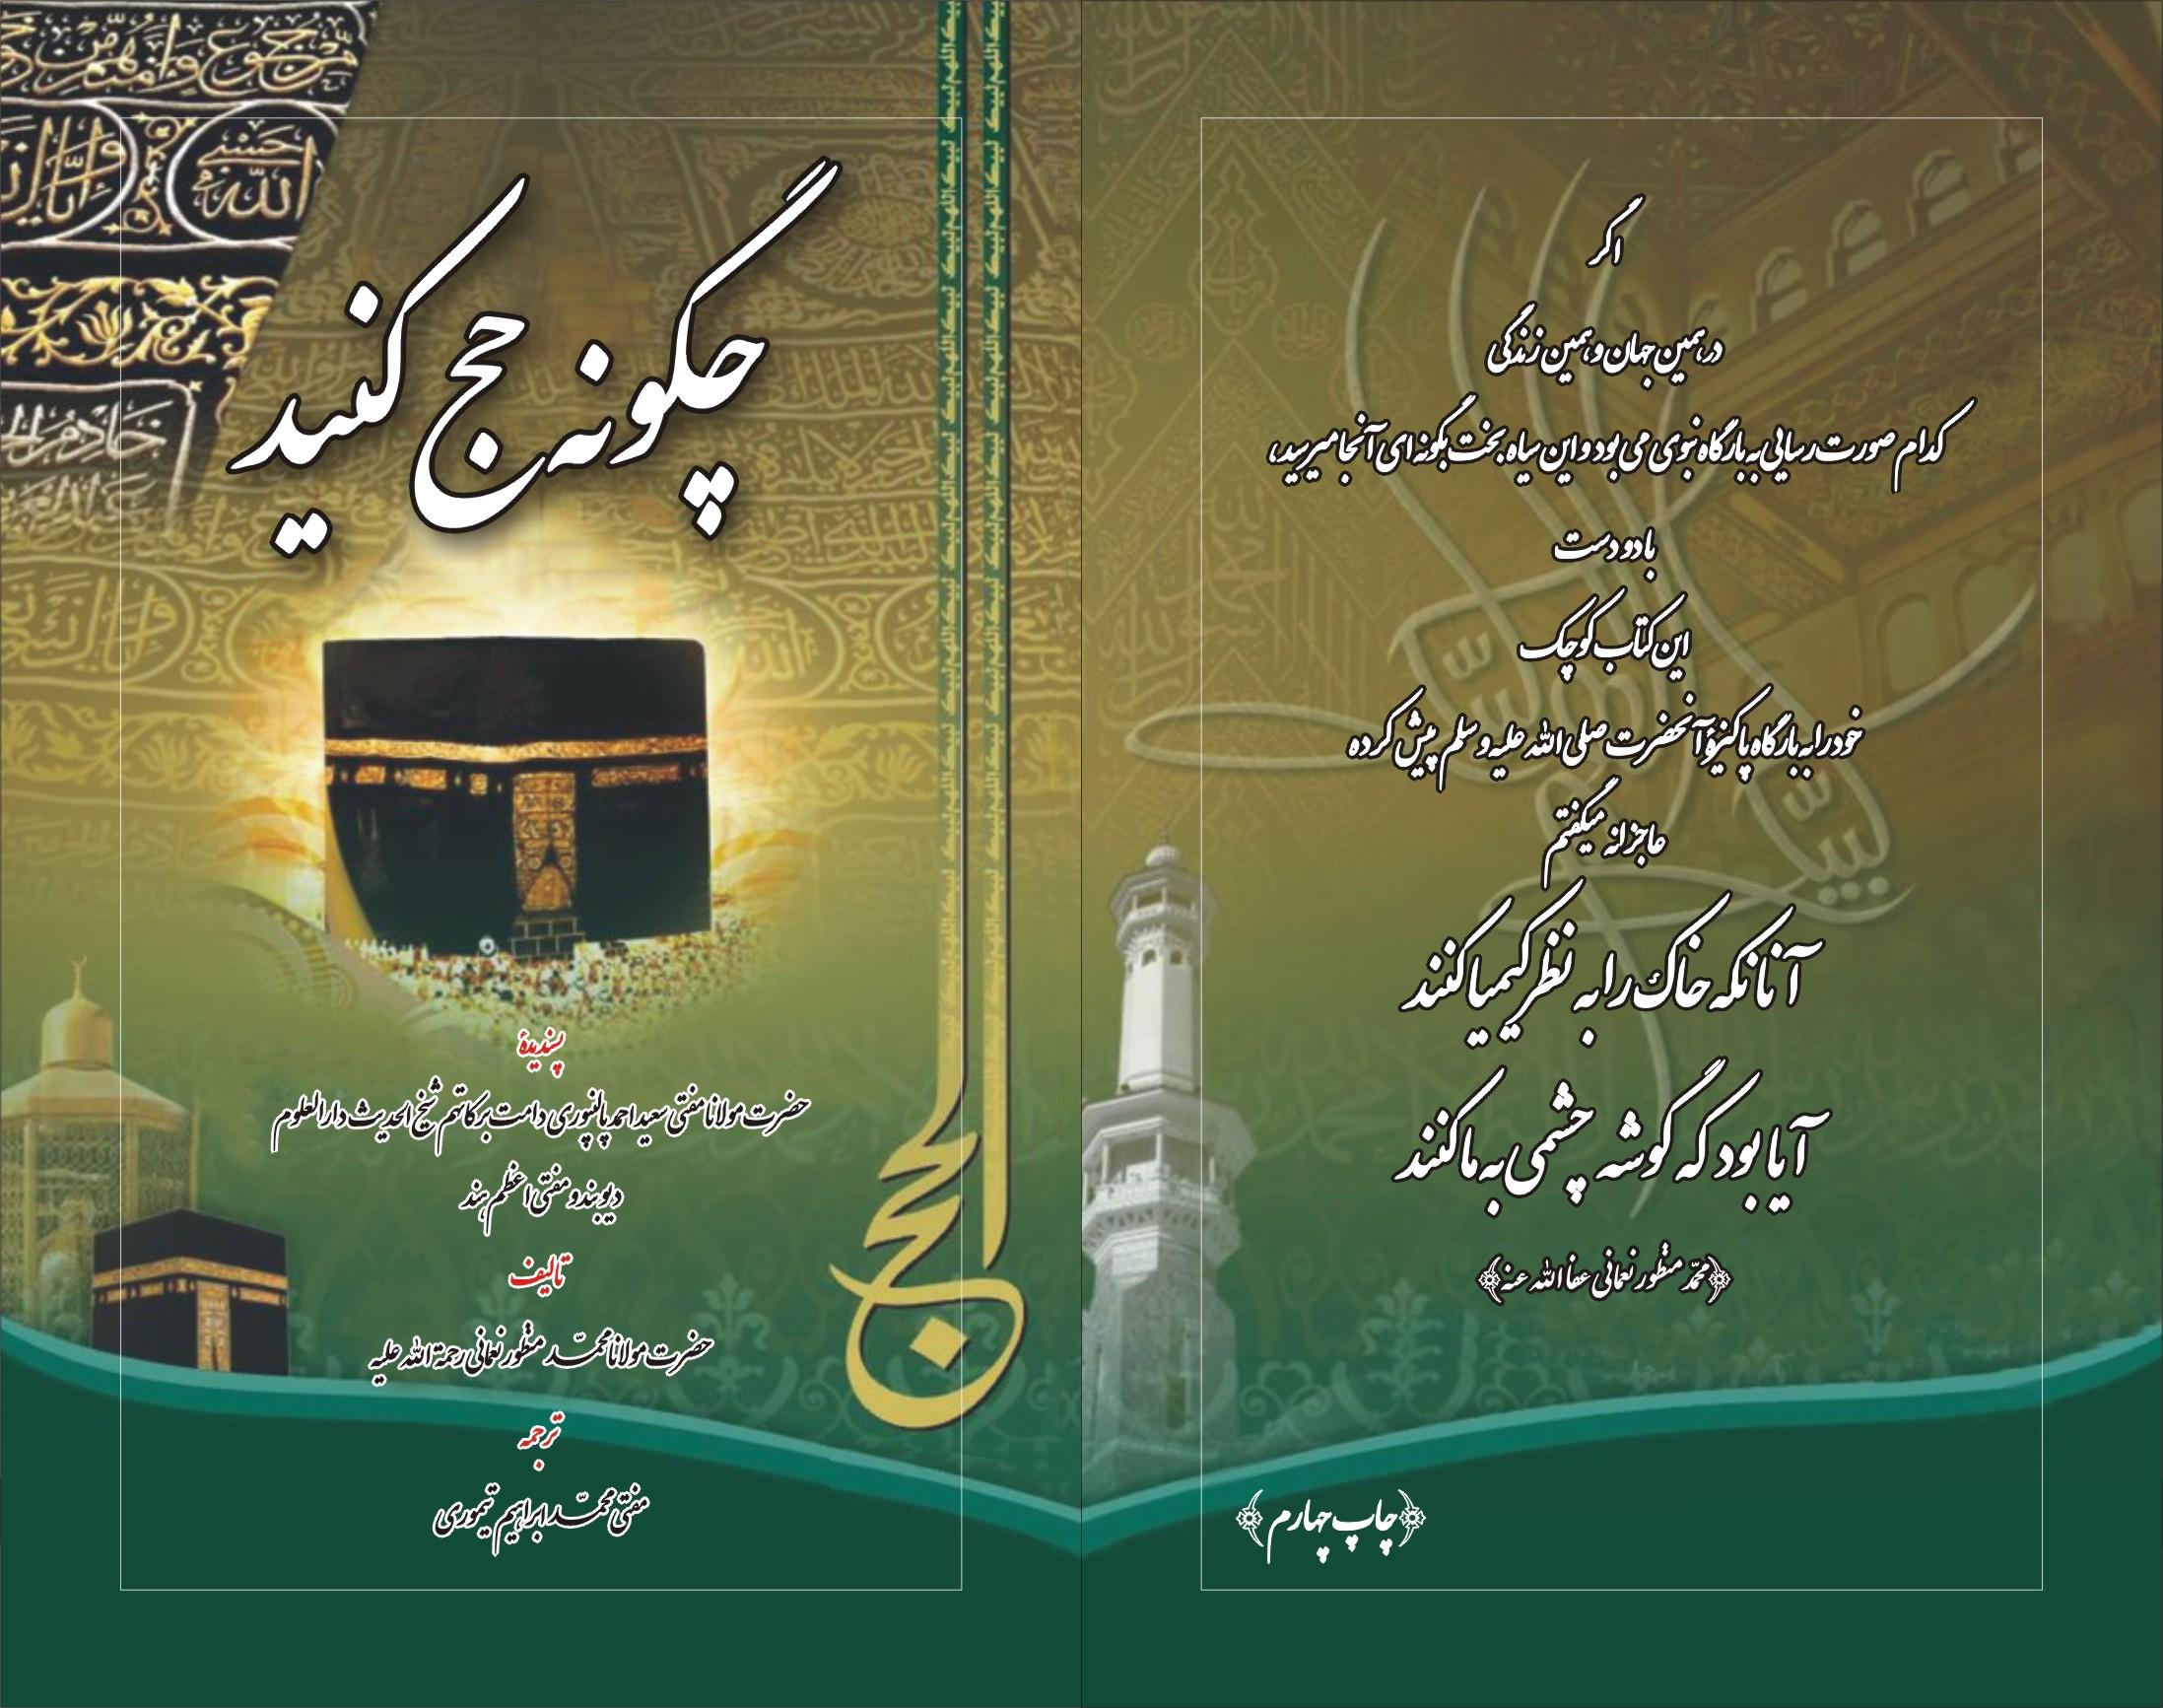 Kitab-e-farsi urdu pdf book free download urdu library pk.